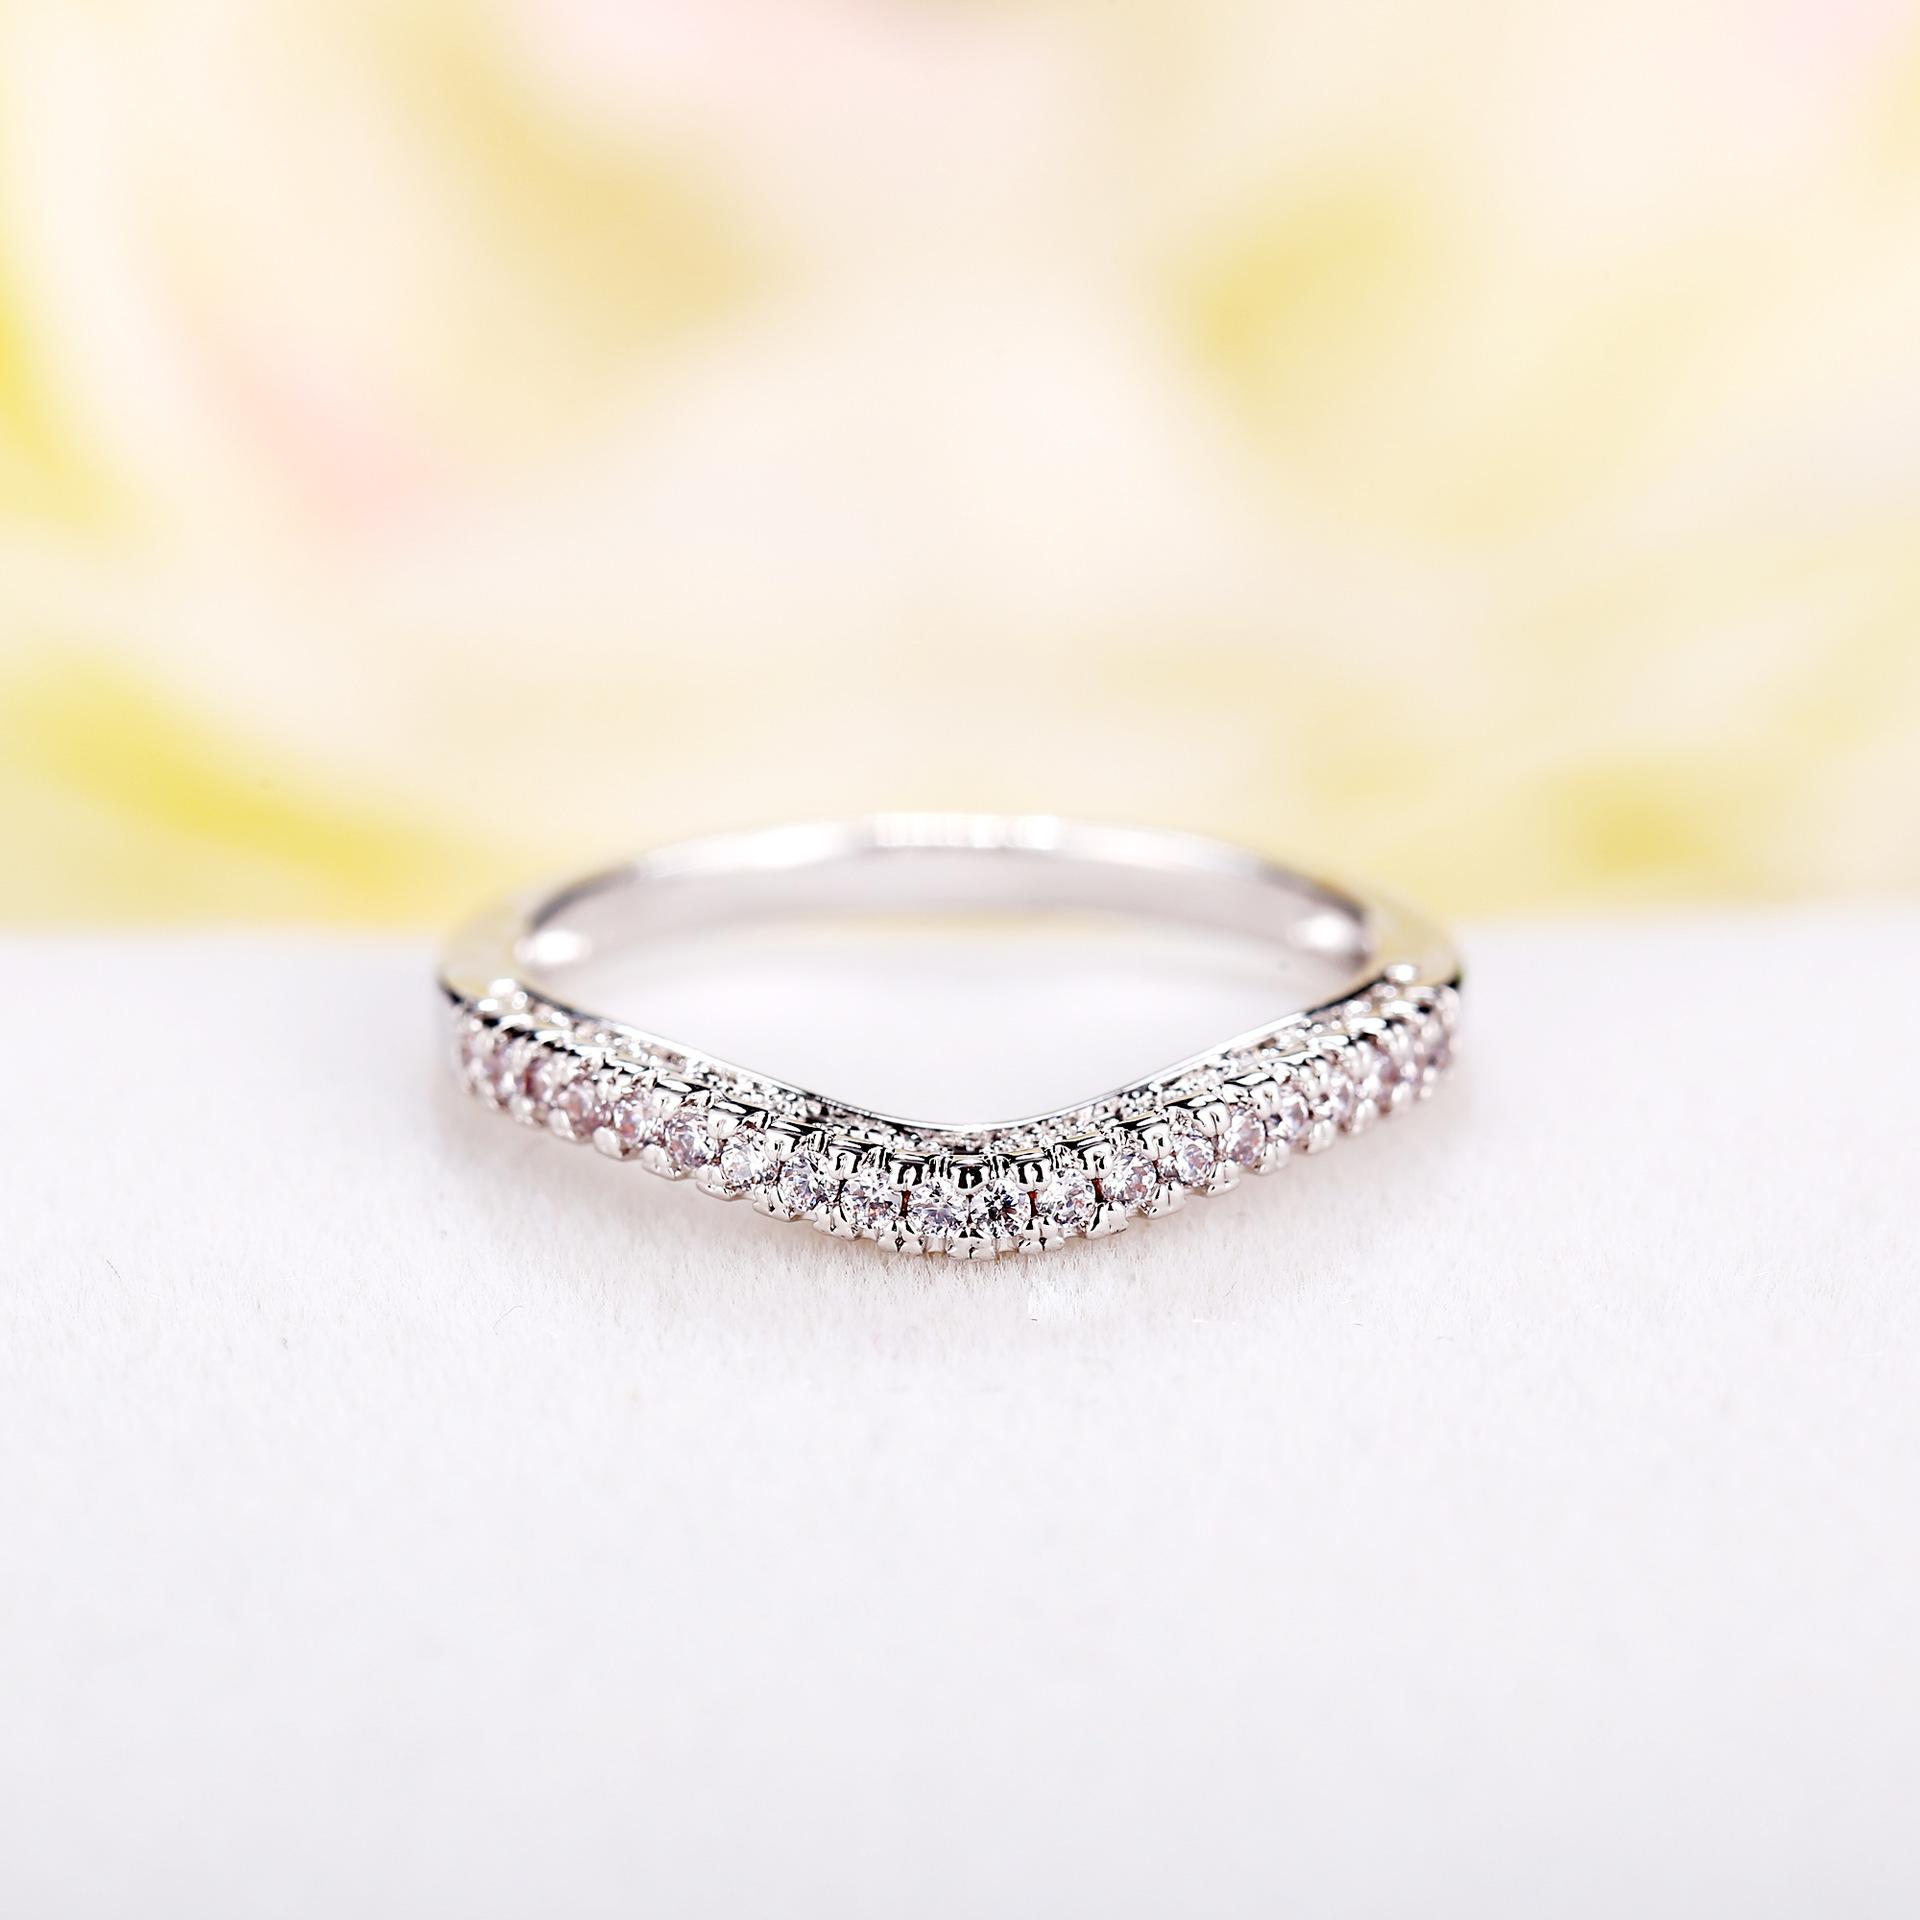 Alloy Fashion Geometric Ring  (Alloy No. 6 GBM11-03)  Fashion Jewelry NHPJ0304-Alloy-No6-GBM11-03